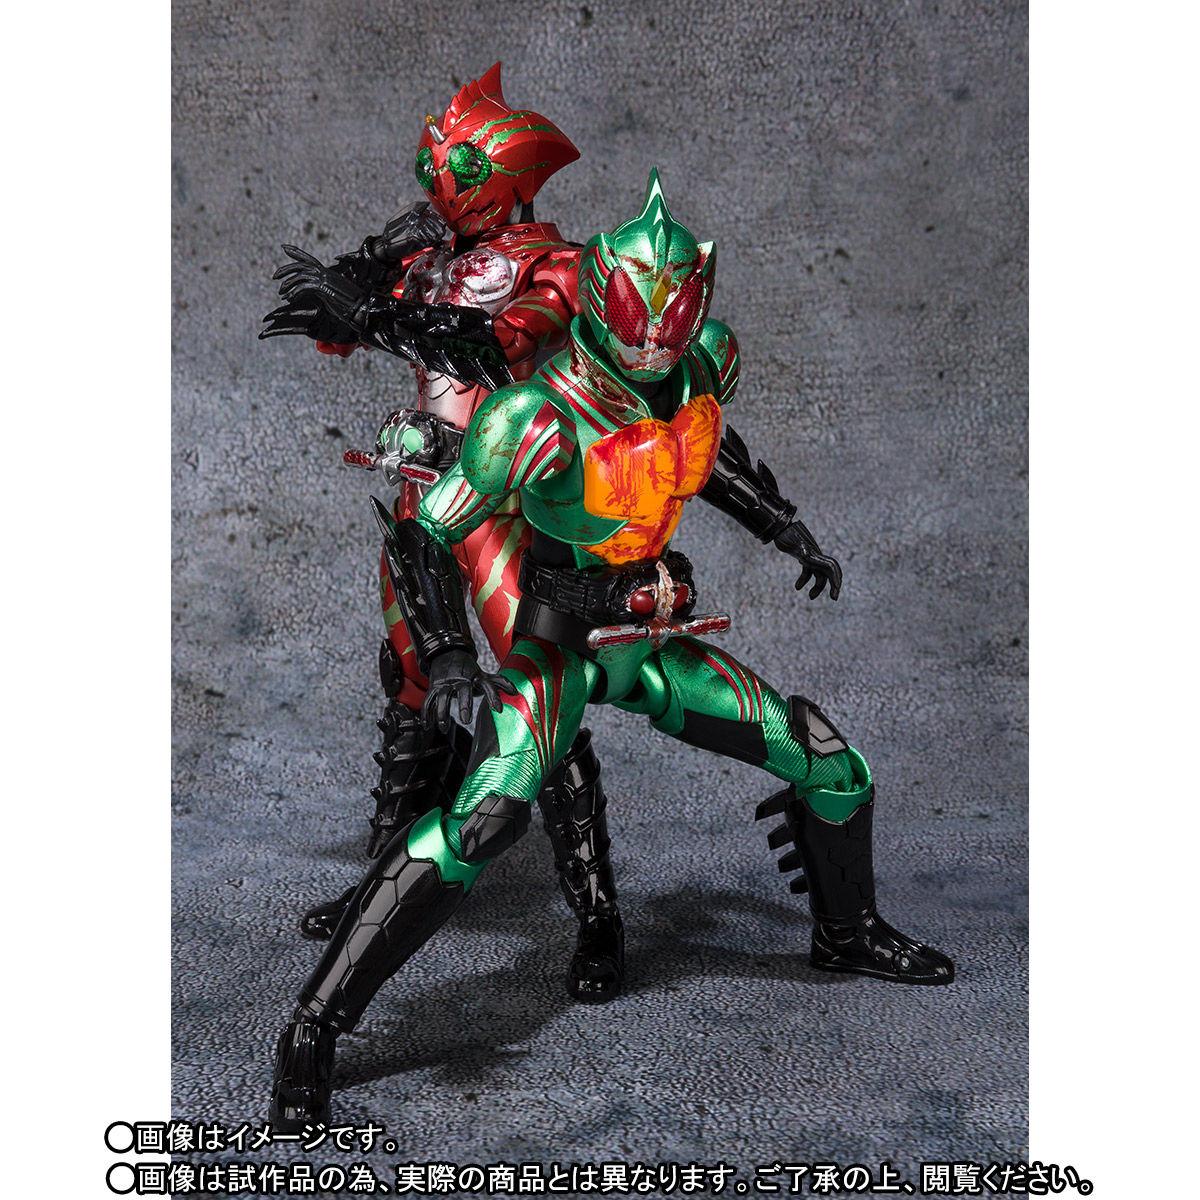 S.H.フィギュアーツ『仮面ライダーアマゾンズ 最後ノ審判セット』可動フィギュア-009